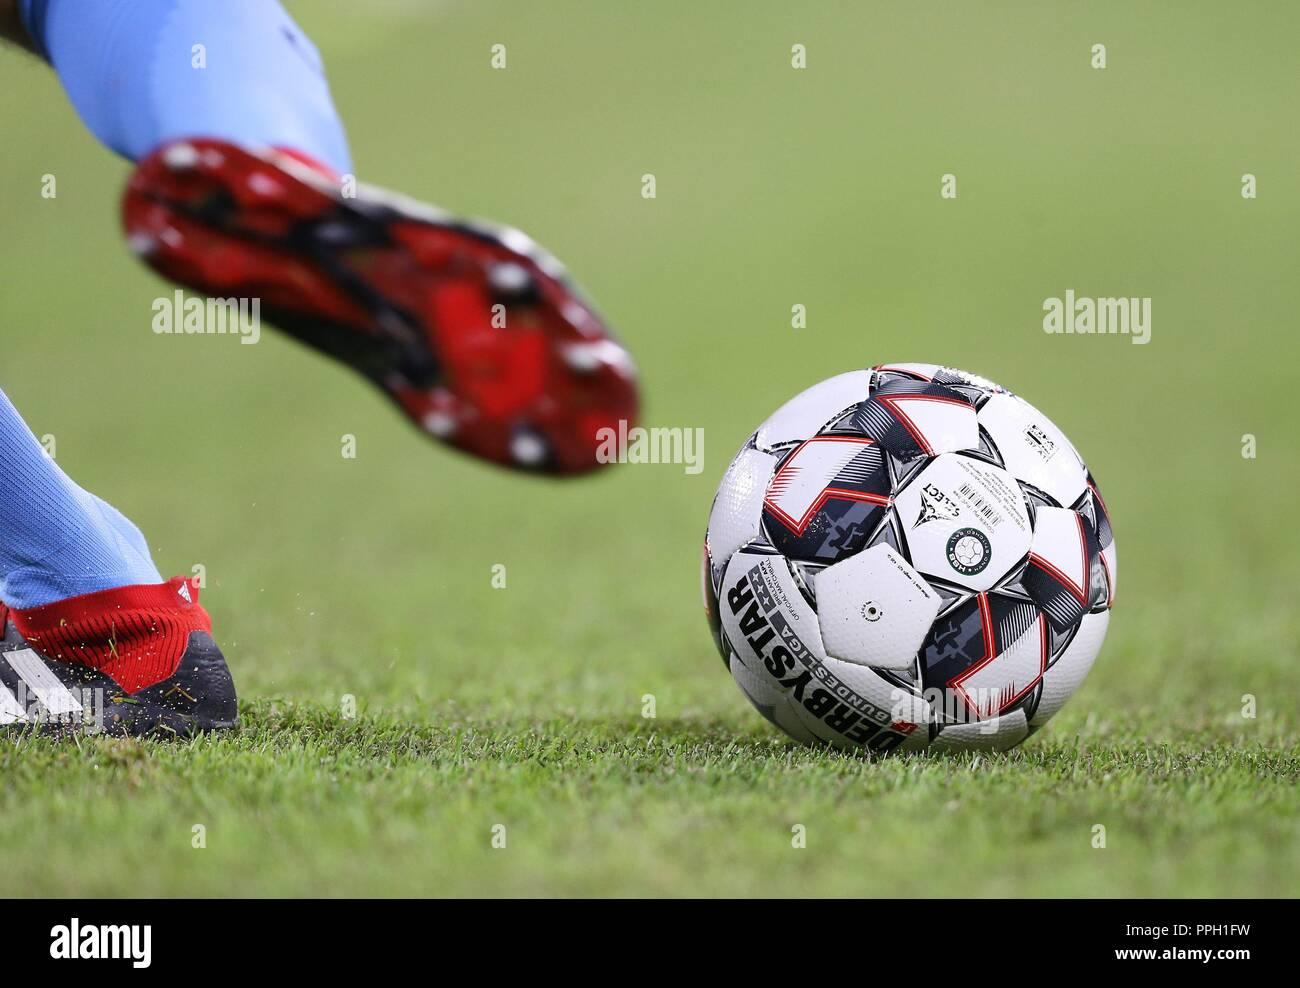 firo: 25.09.2018 Fuvuball, Football: 1.Bundesliga FC Bayern Munich - FC Augsburg, Derbystar, Ball, Feature, General,   usage worldwide - Stock Image